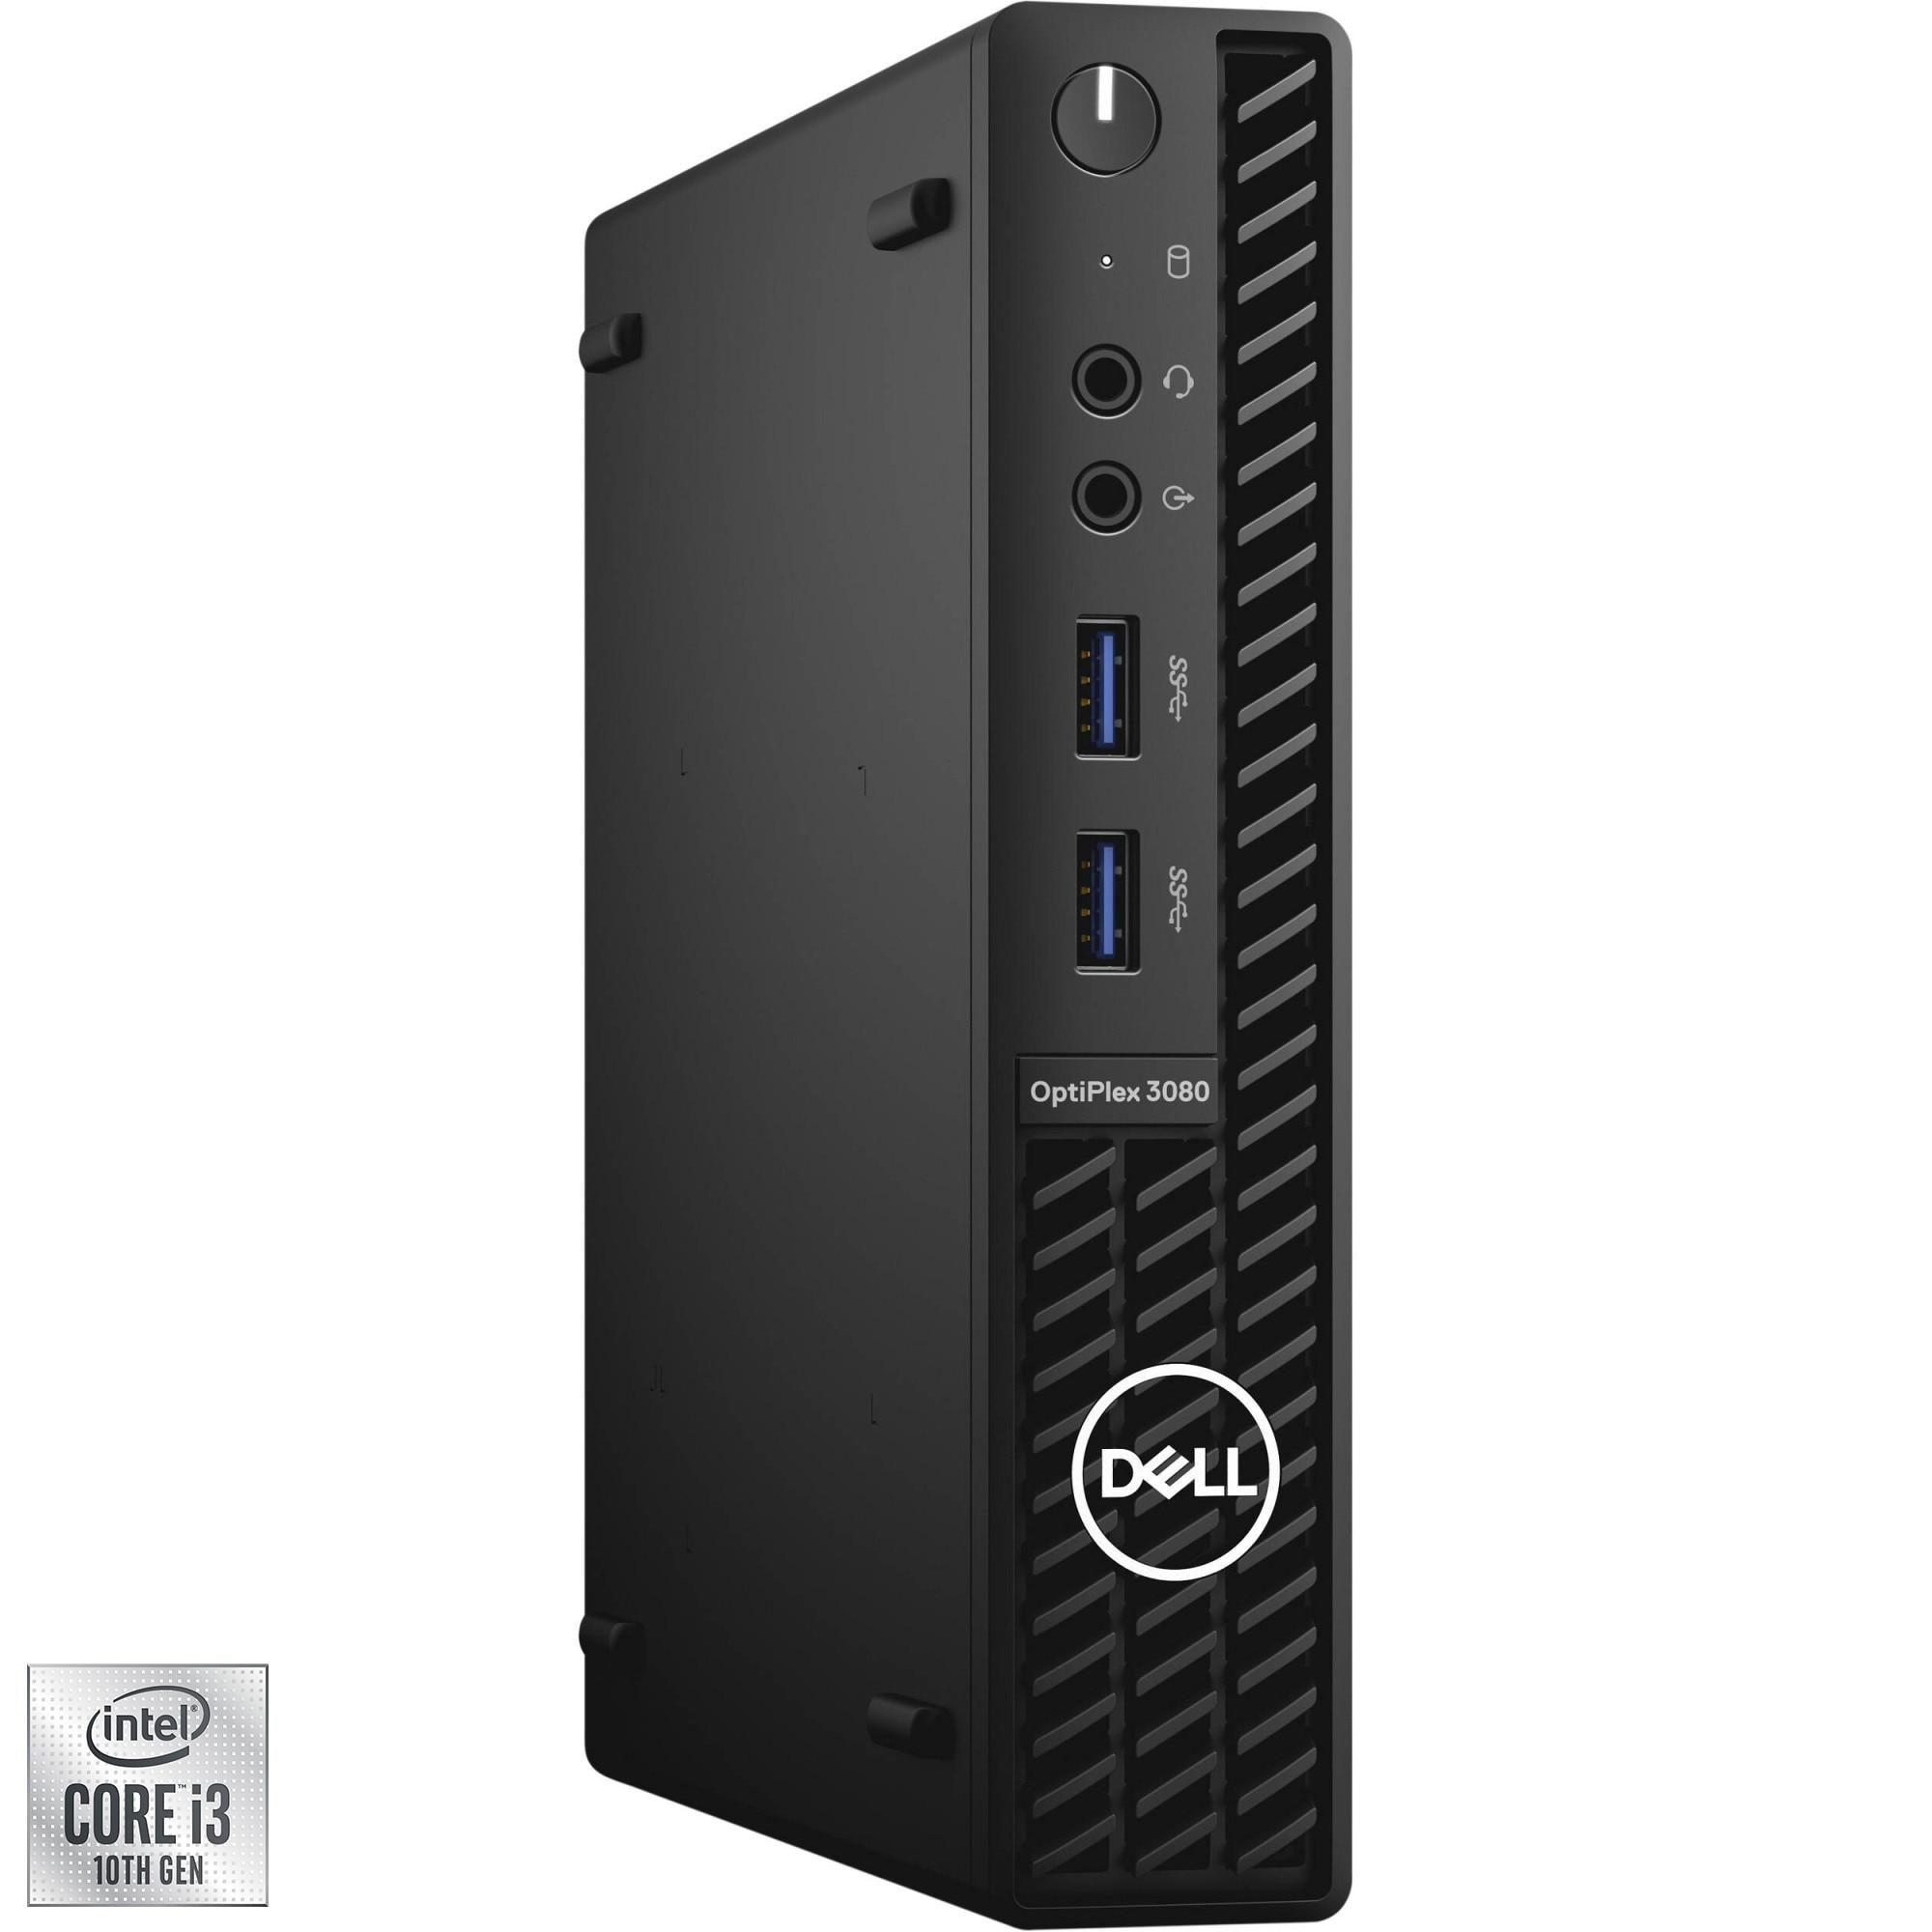 Fotografie Sistem Desktop Dell OptiPlex 3080 MFF cu procesor Intel® Core™ i3-10100T pana la 3.80 GHz, Comet Lake, 8GB DDR4, 256GB SSD, Intel® UHD Graphics 630, Windows 10 Pro